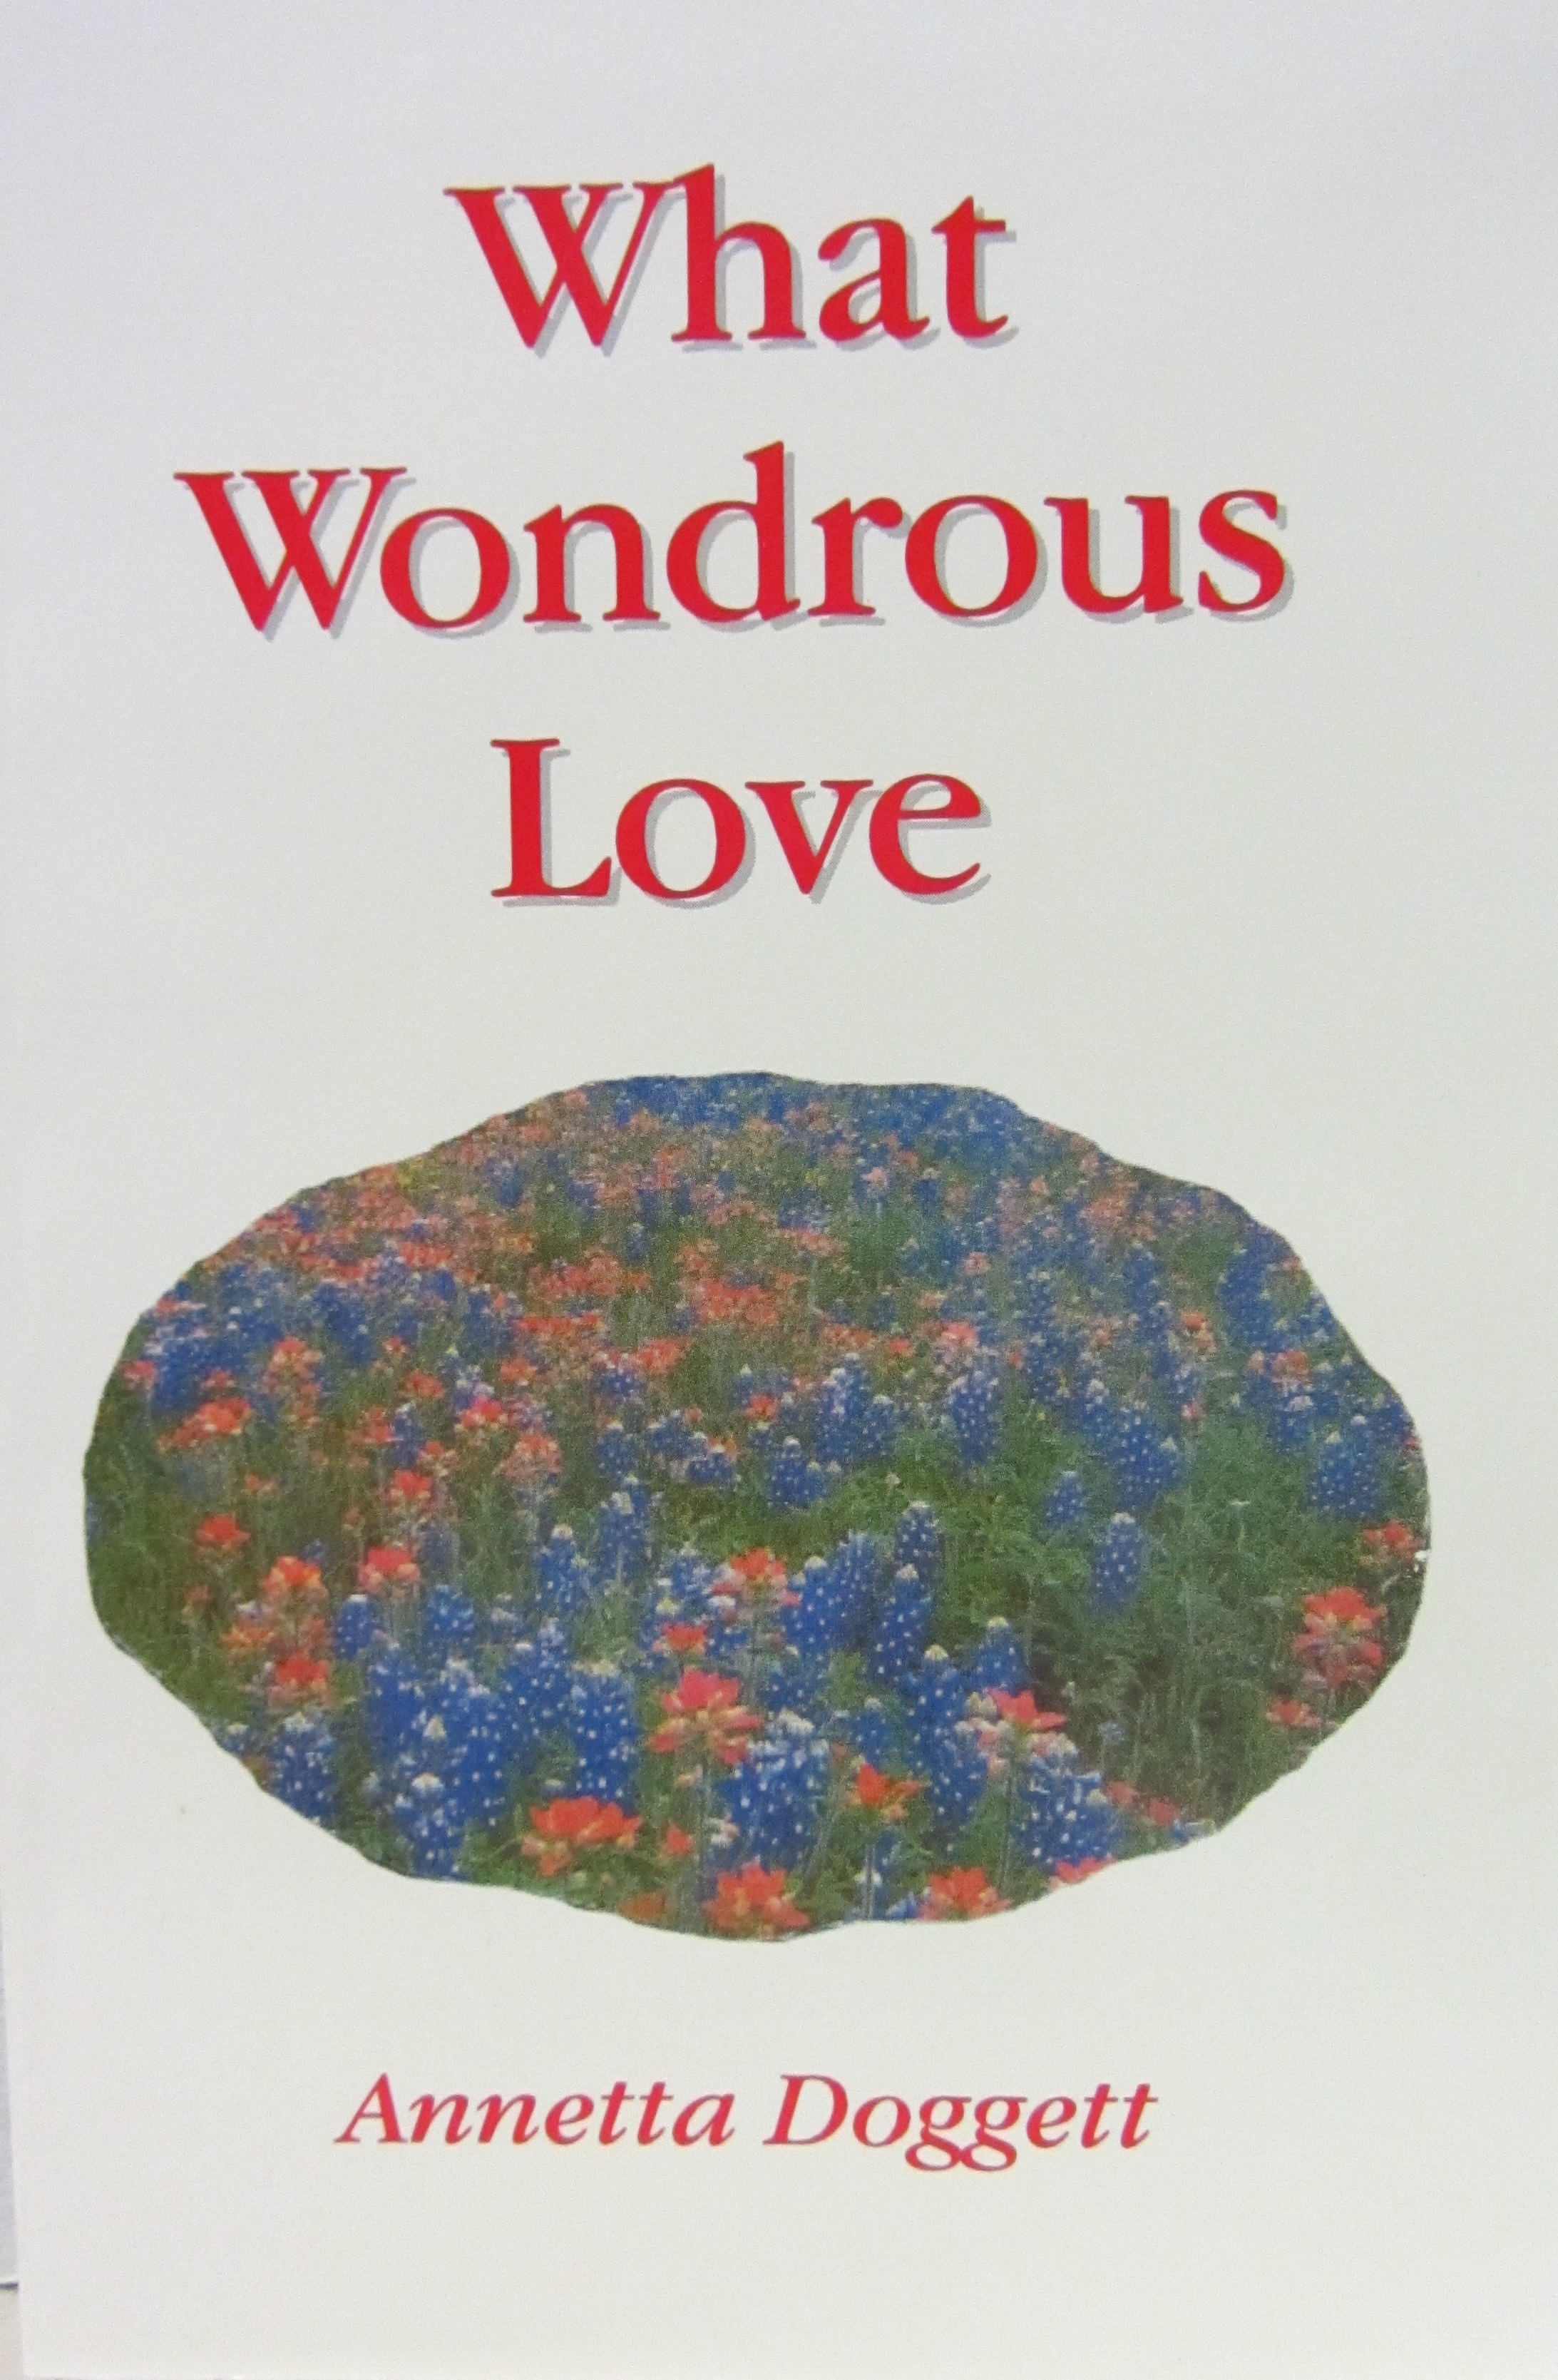 What+Wondrous+Love.jpg